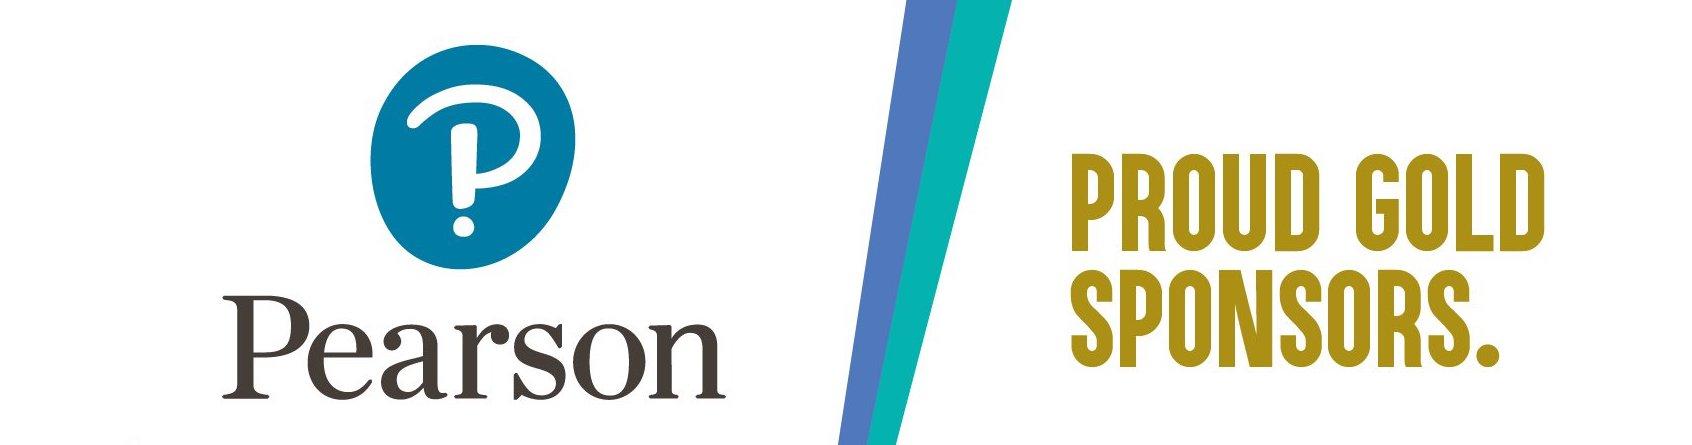 Pearson sponsor logo cropped